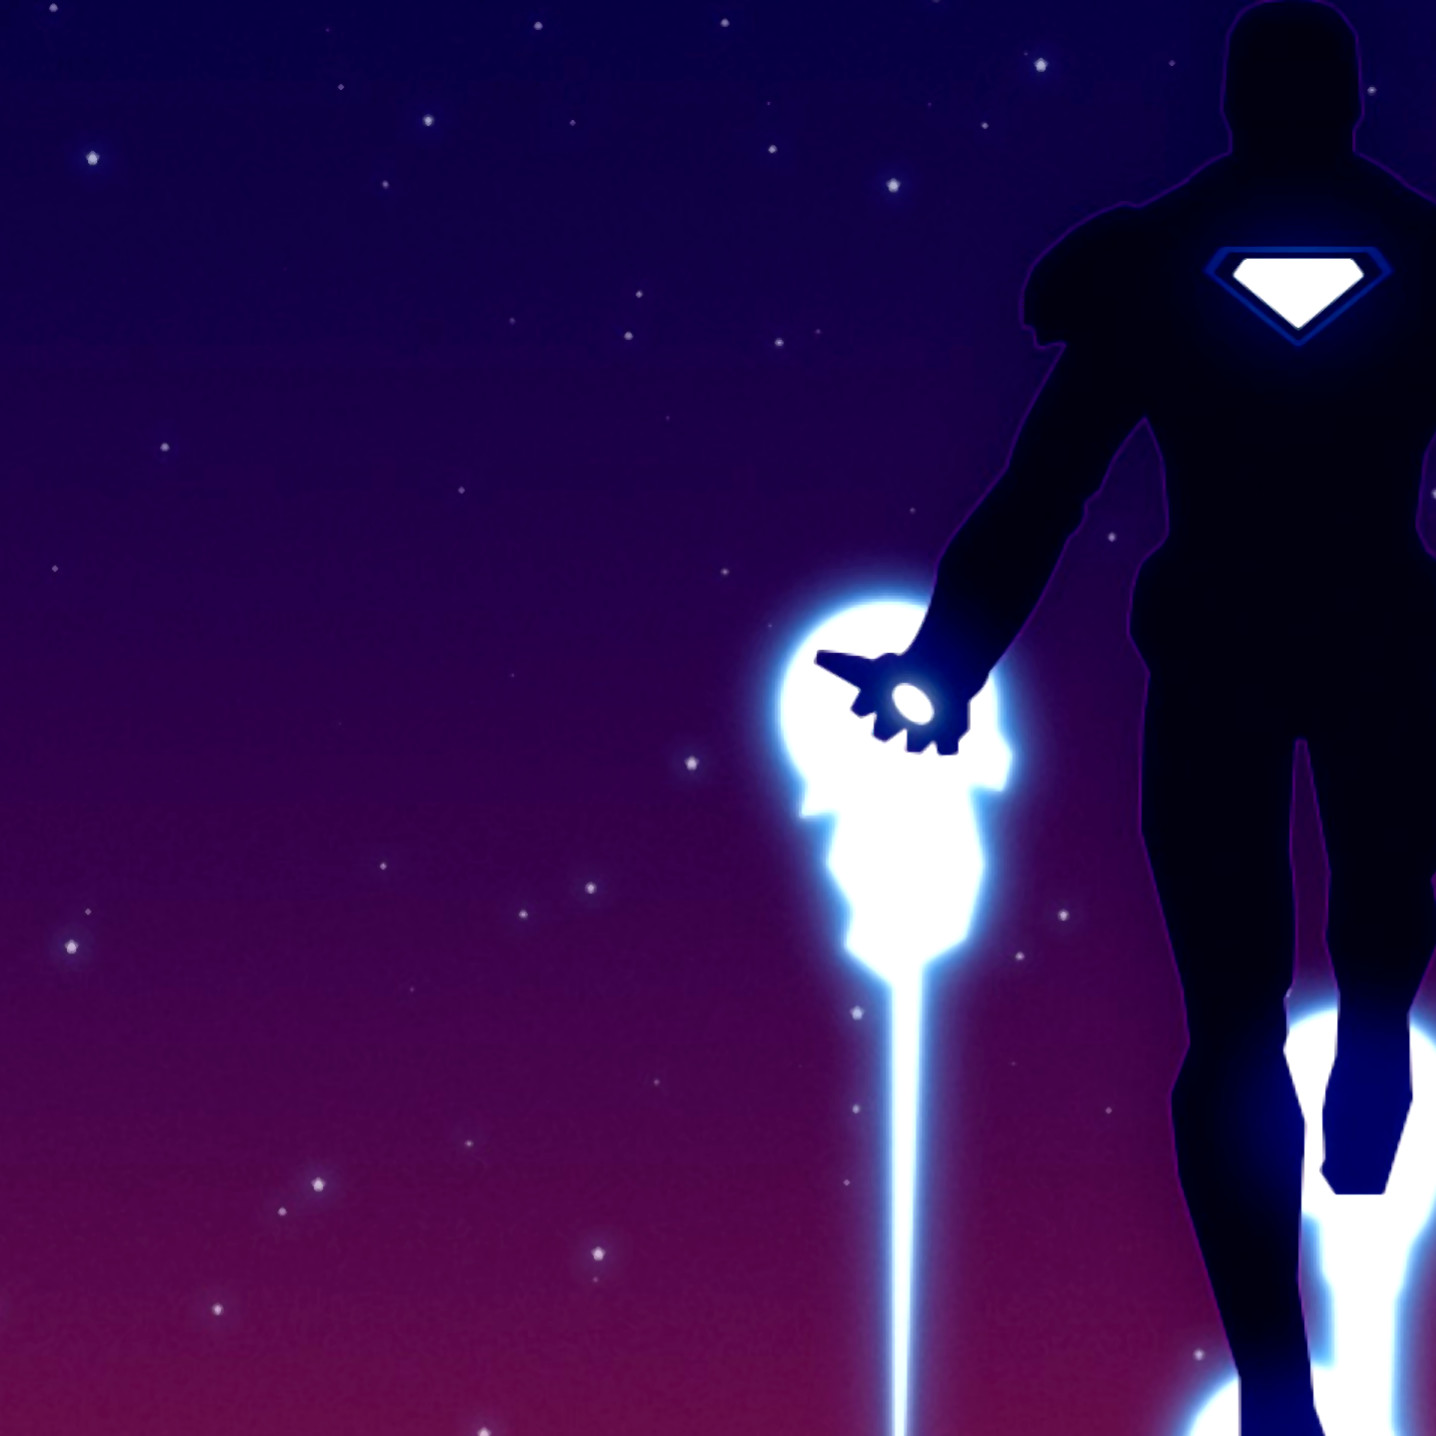 Iron Man S10 by u/Aymms16